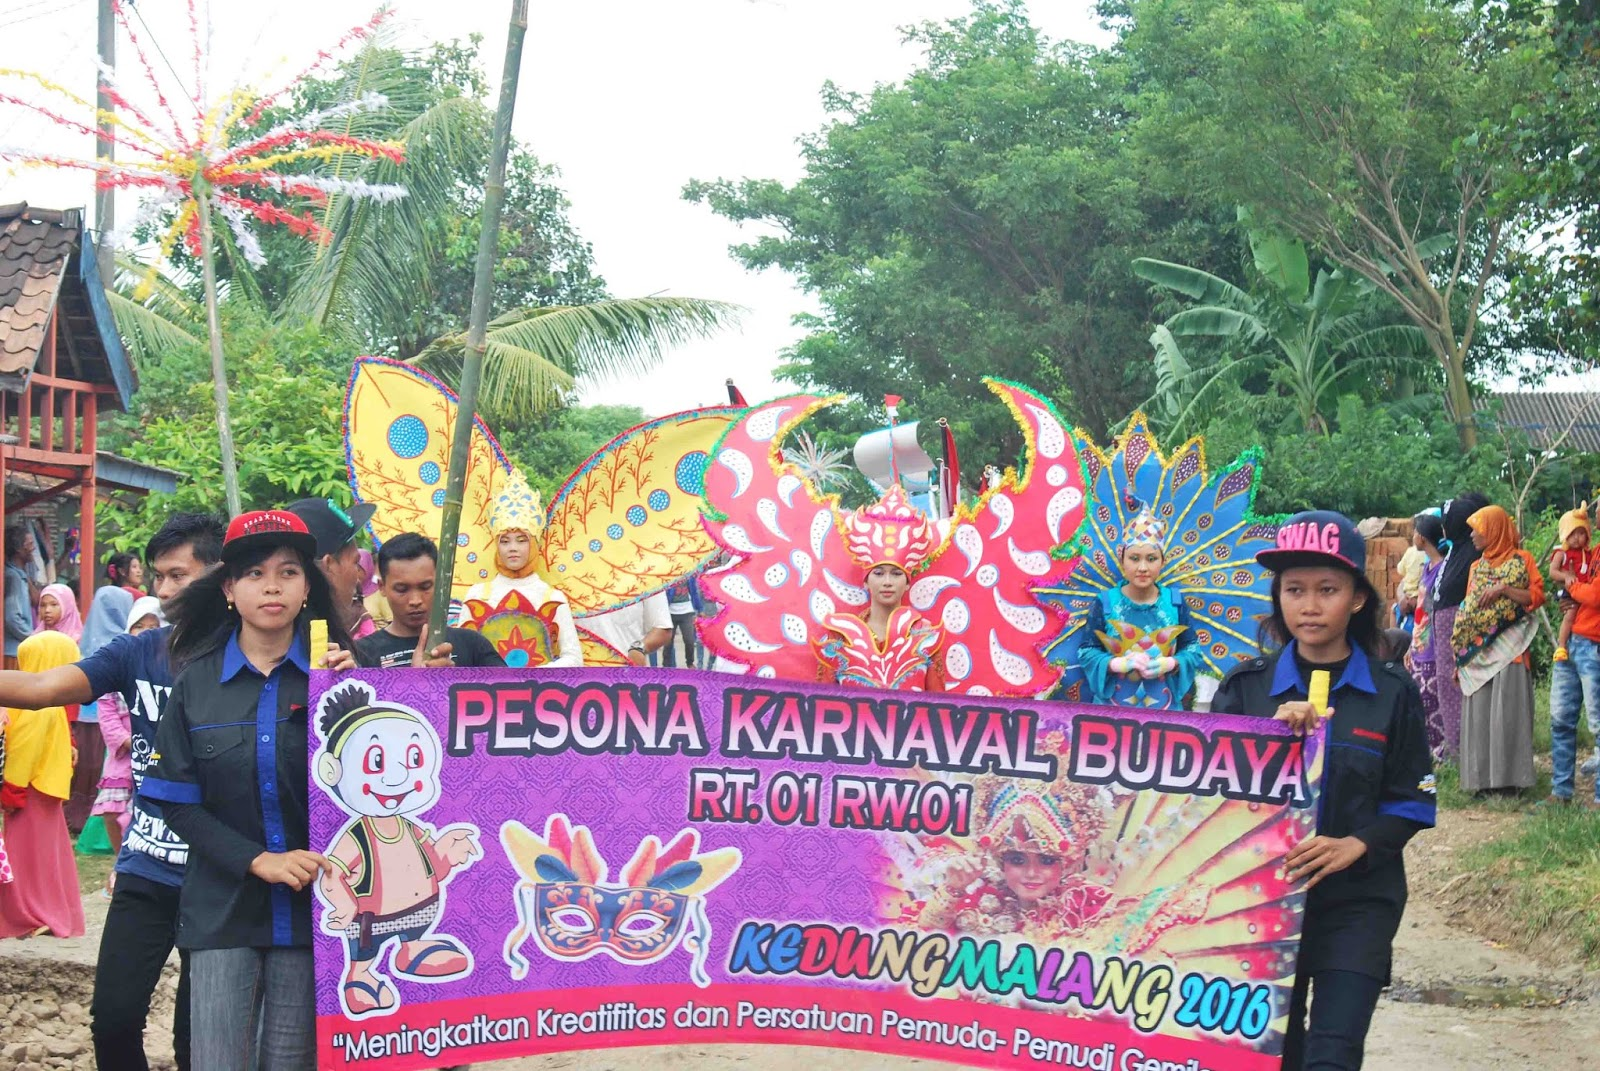 gebyar karnaval haul syeh maulana kedungmalang jepara 2016